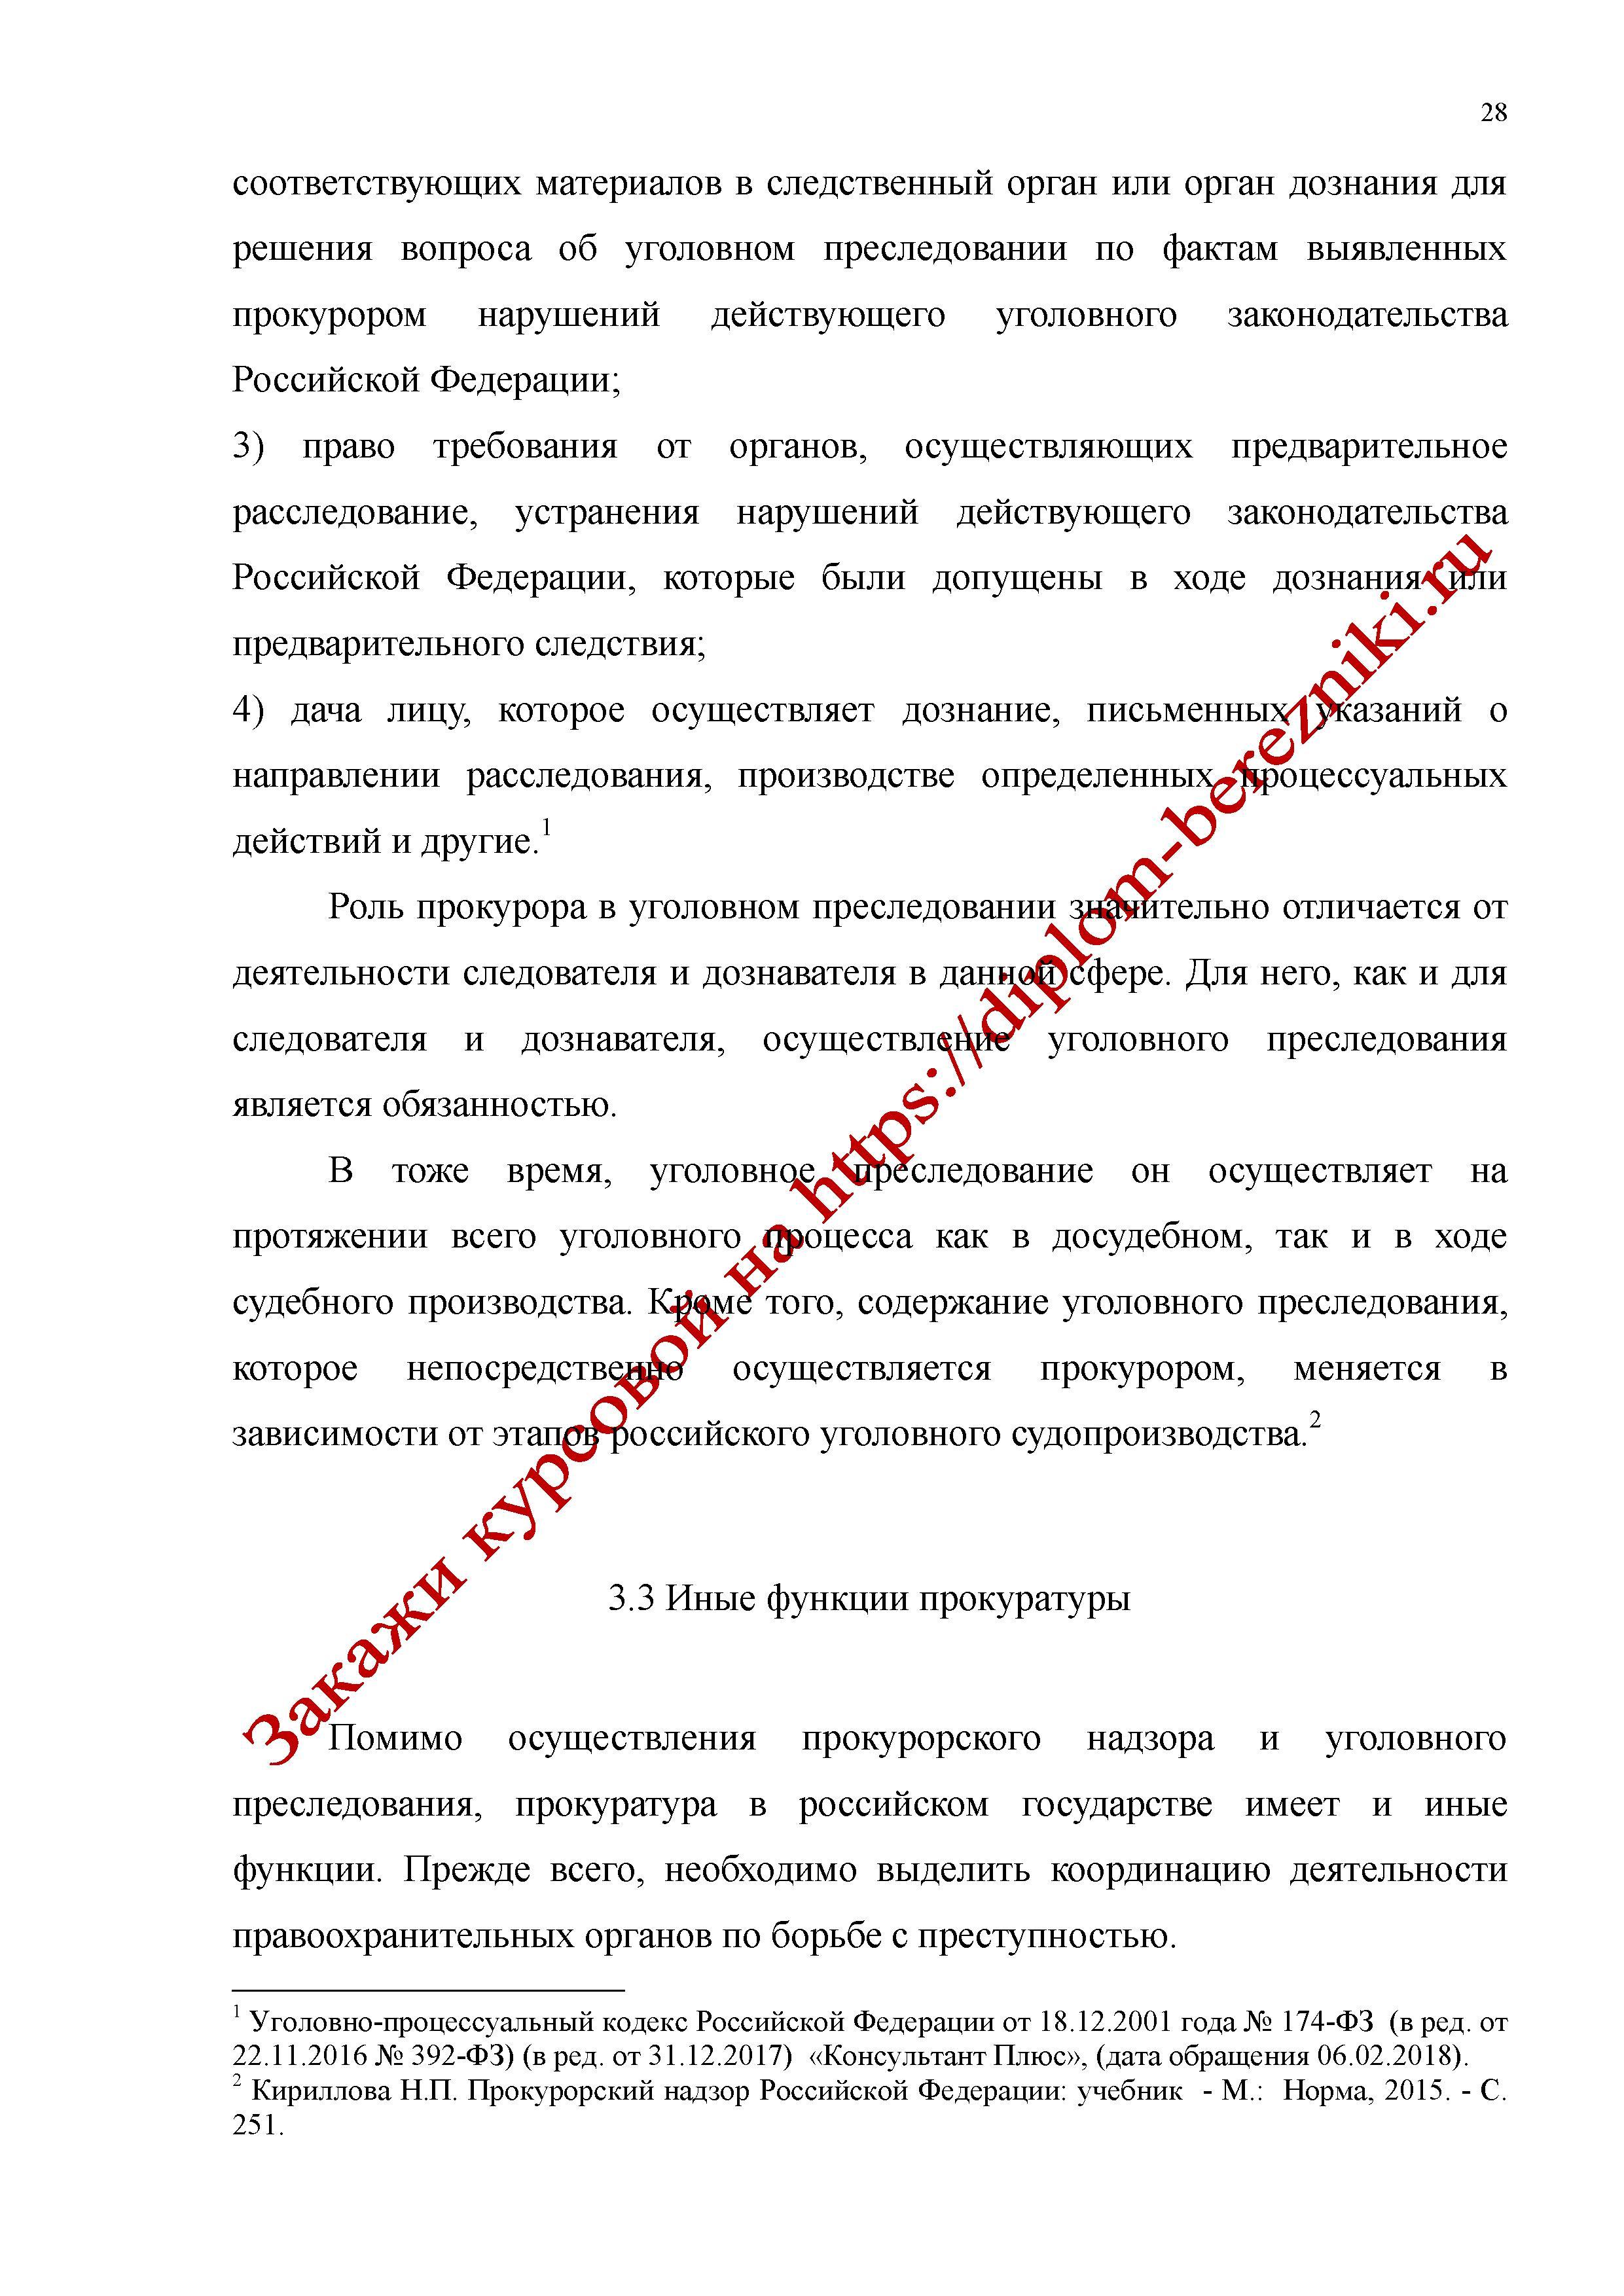 структура органов прокуратуры рф